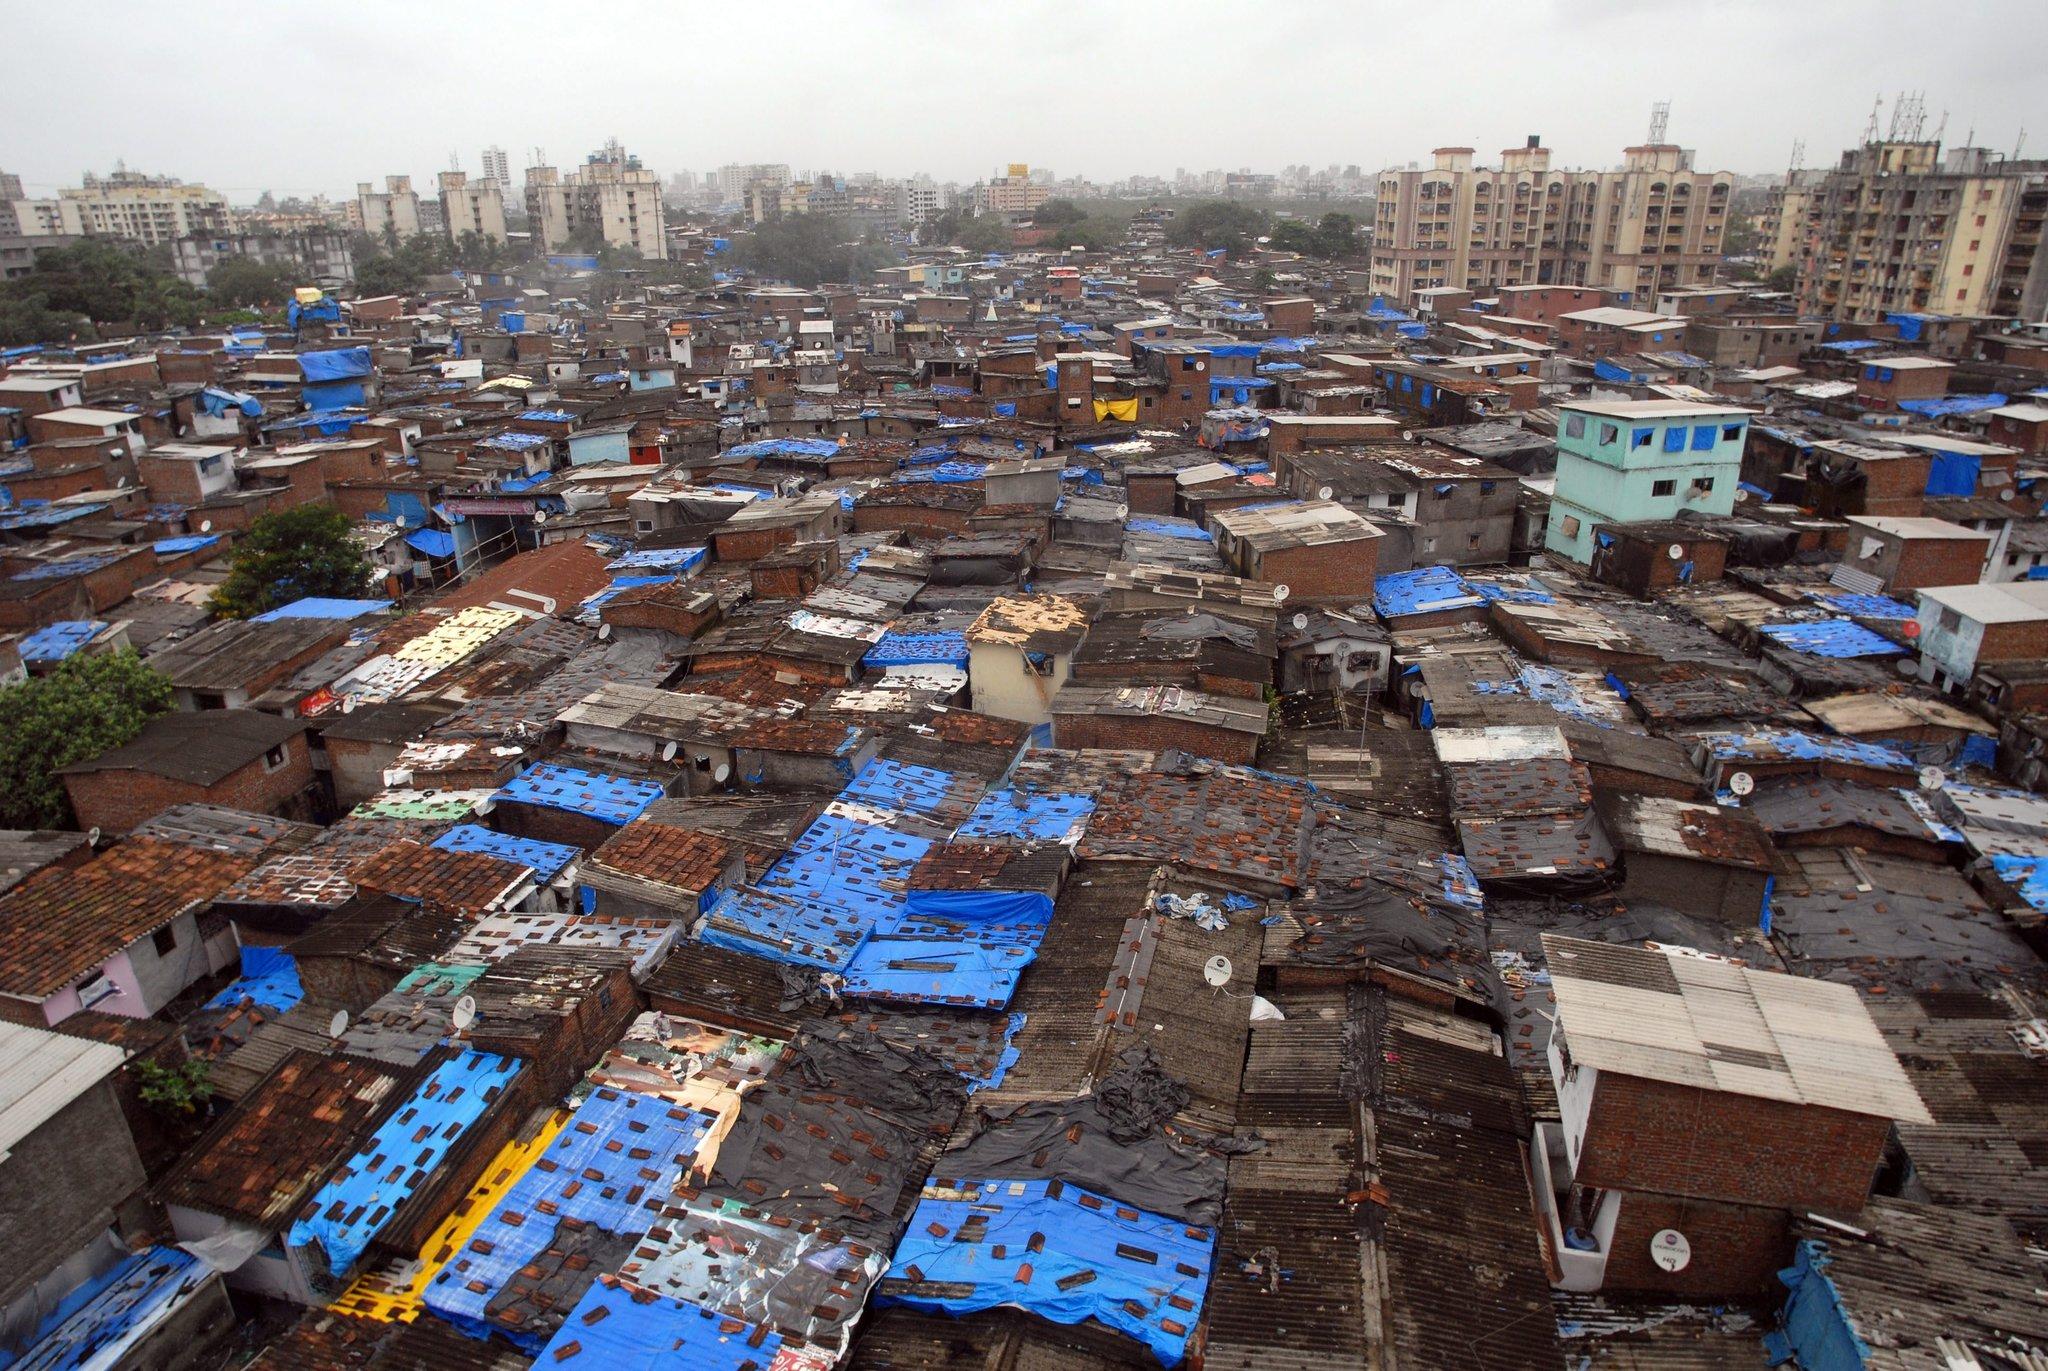 shanty town mumbai india.jpg